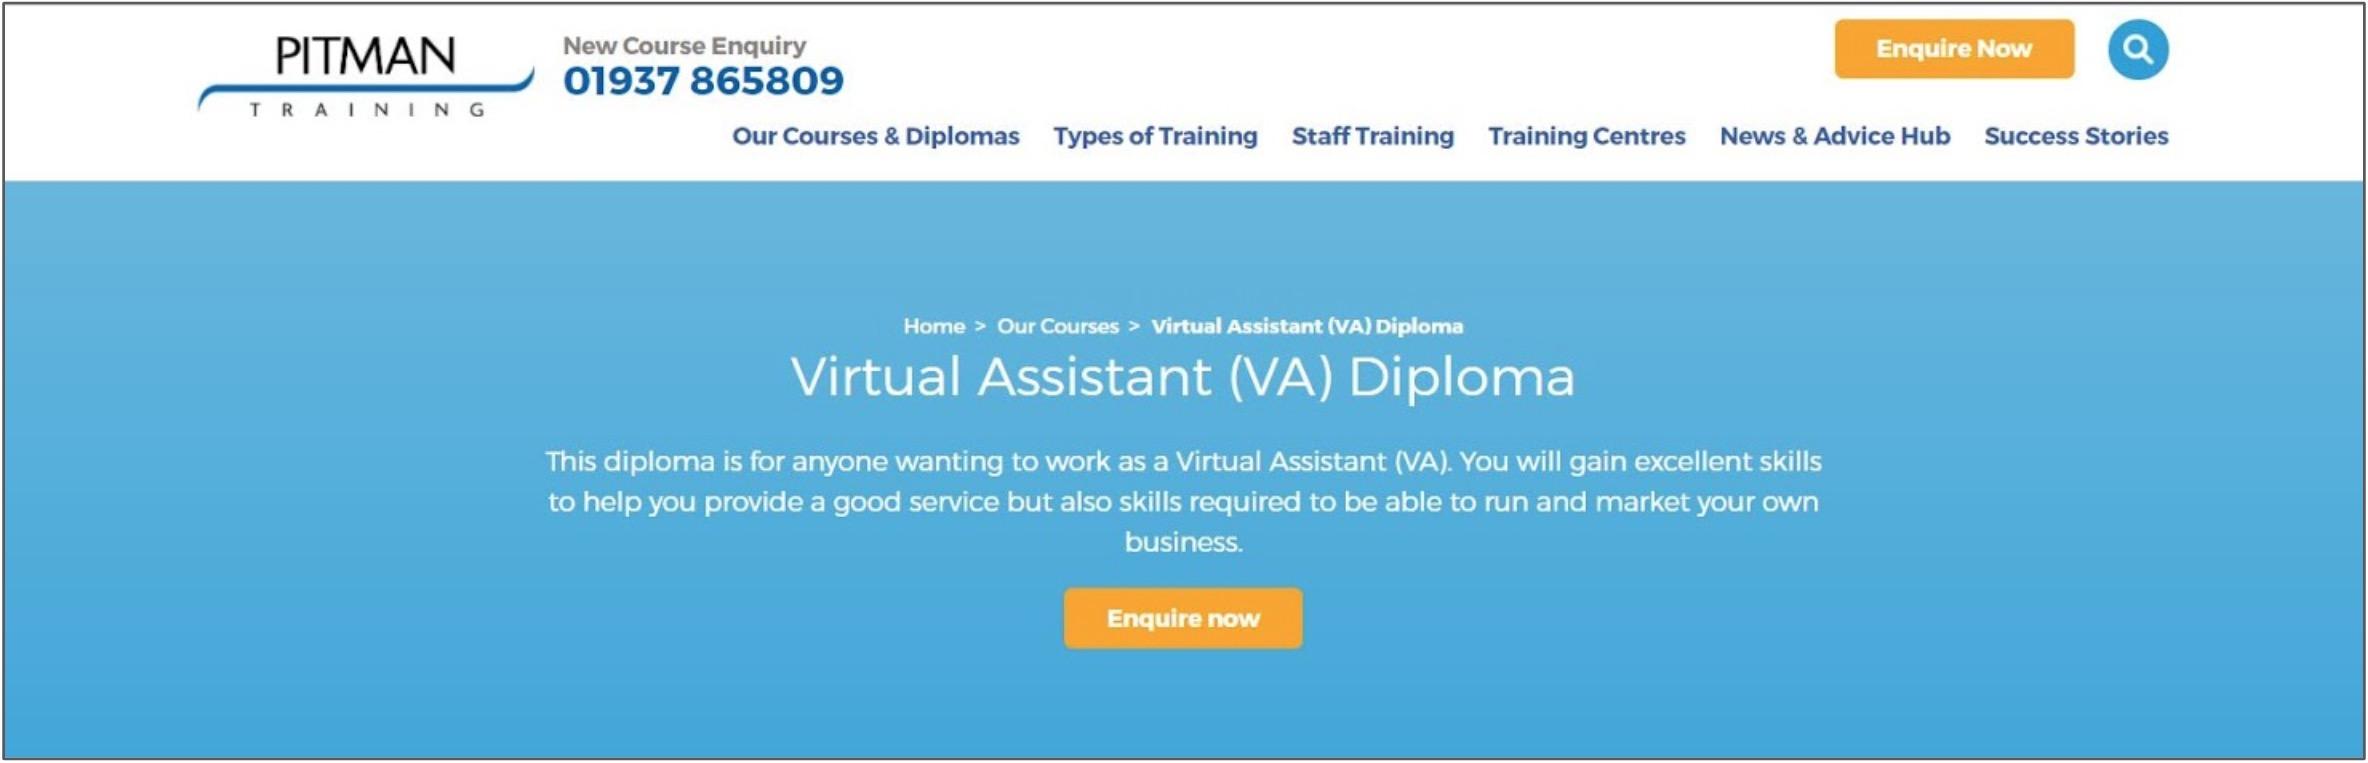 Screenshot of a Virtual Assistant Diploma on Pitman Training